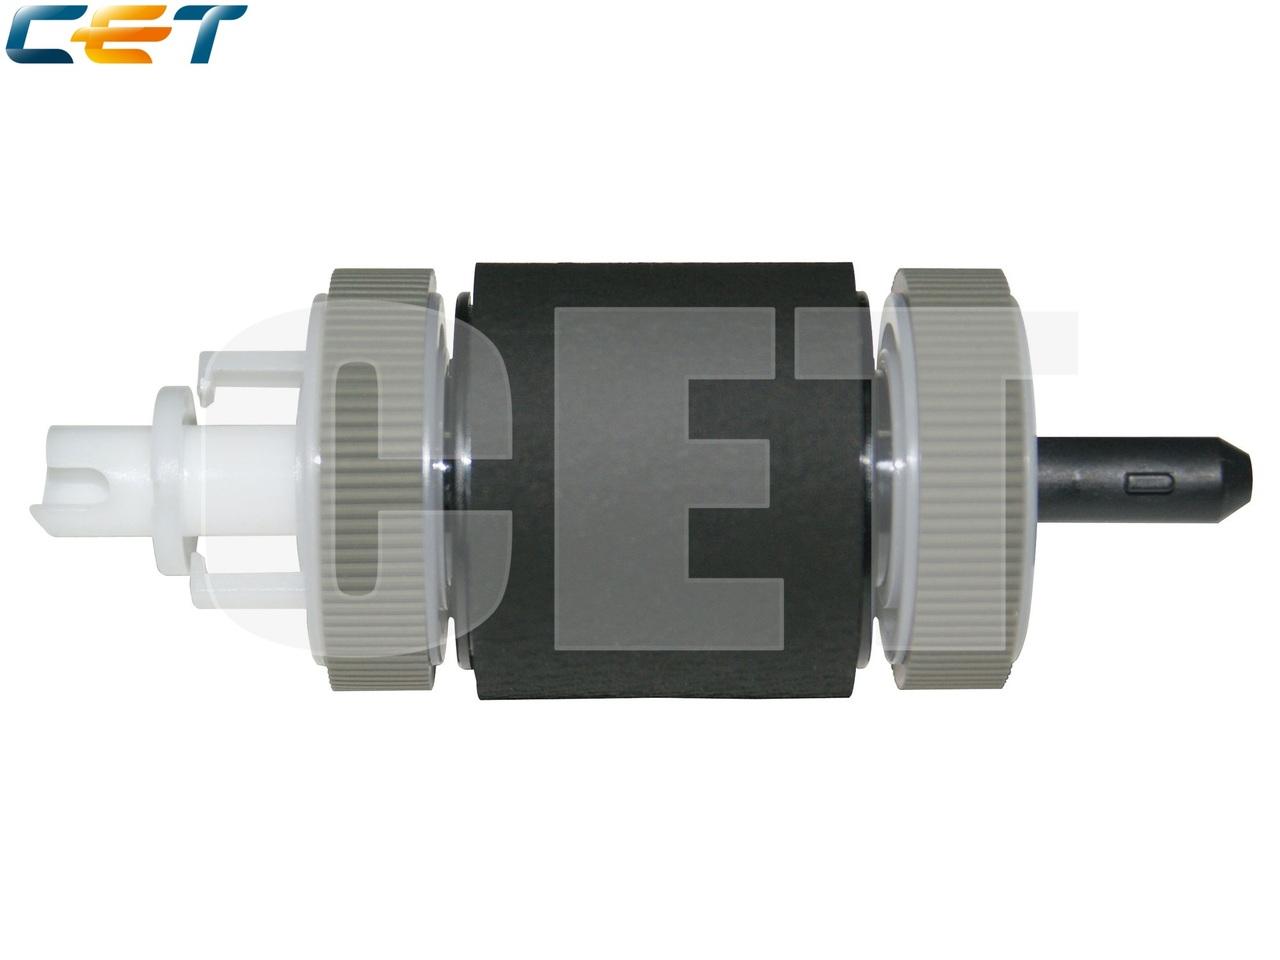 Ролик подхвата 2-го лотка в сборе RM1-3763-000,RM1-6313-000 для HP LaserJet Enterprise P3015/P3005,M521/M525 (CET), CET3519